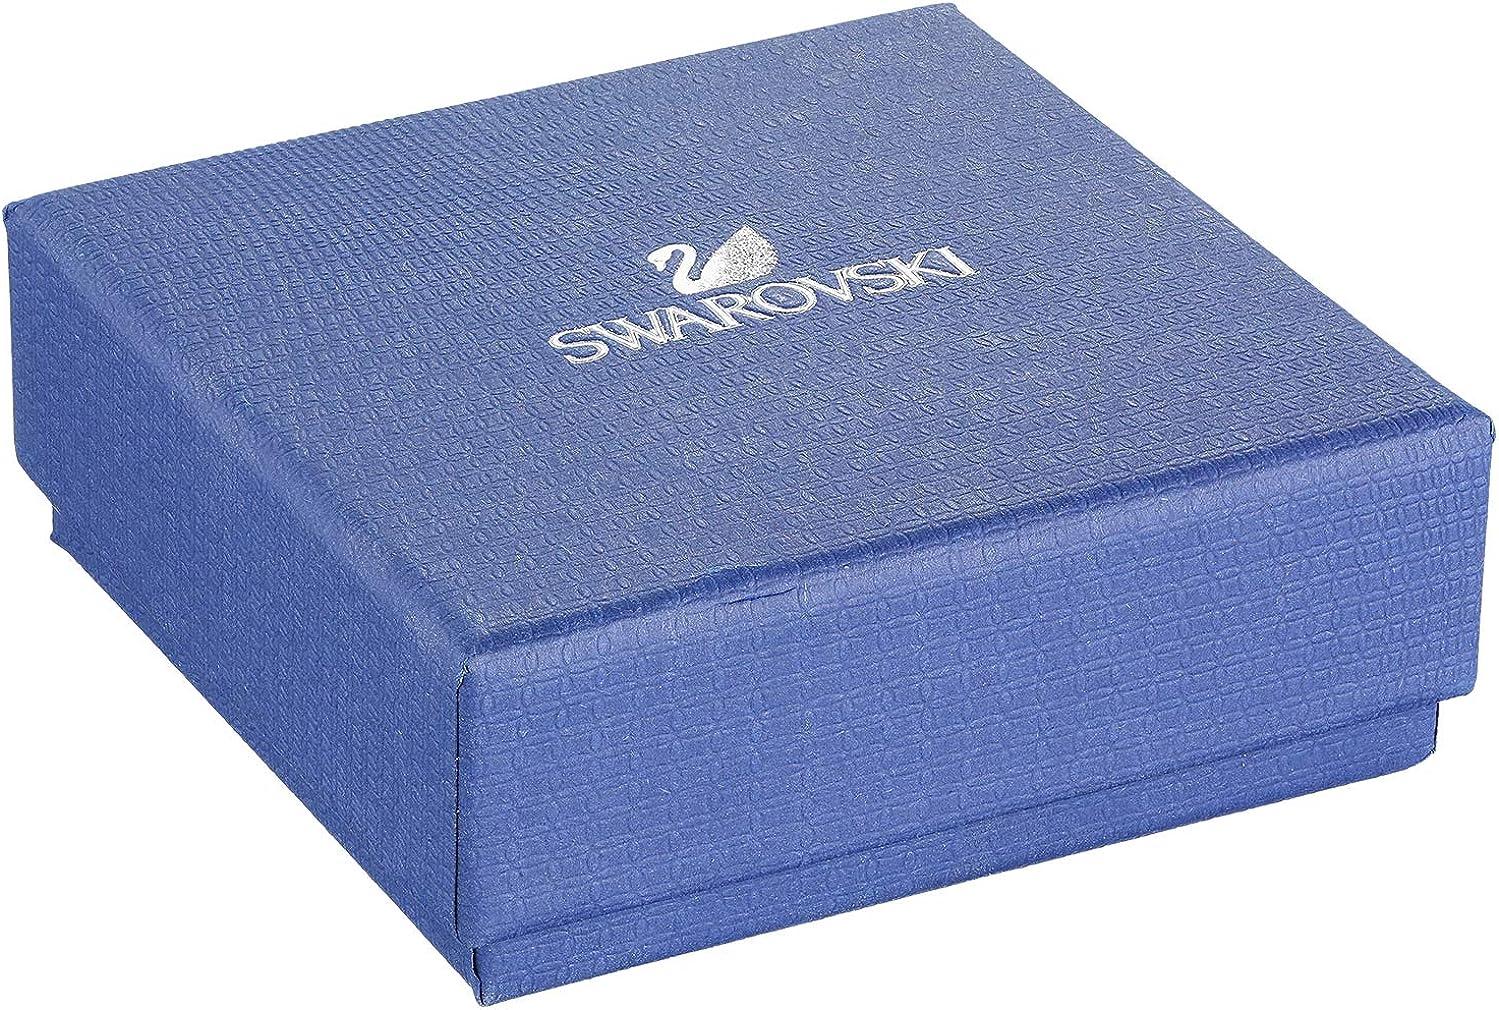 Swarovski Crystal Angelic Stud Earrings, Gold-Tone